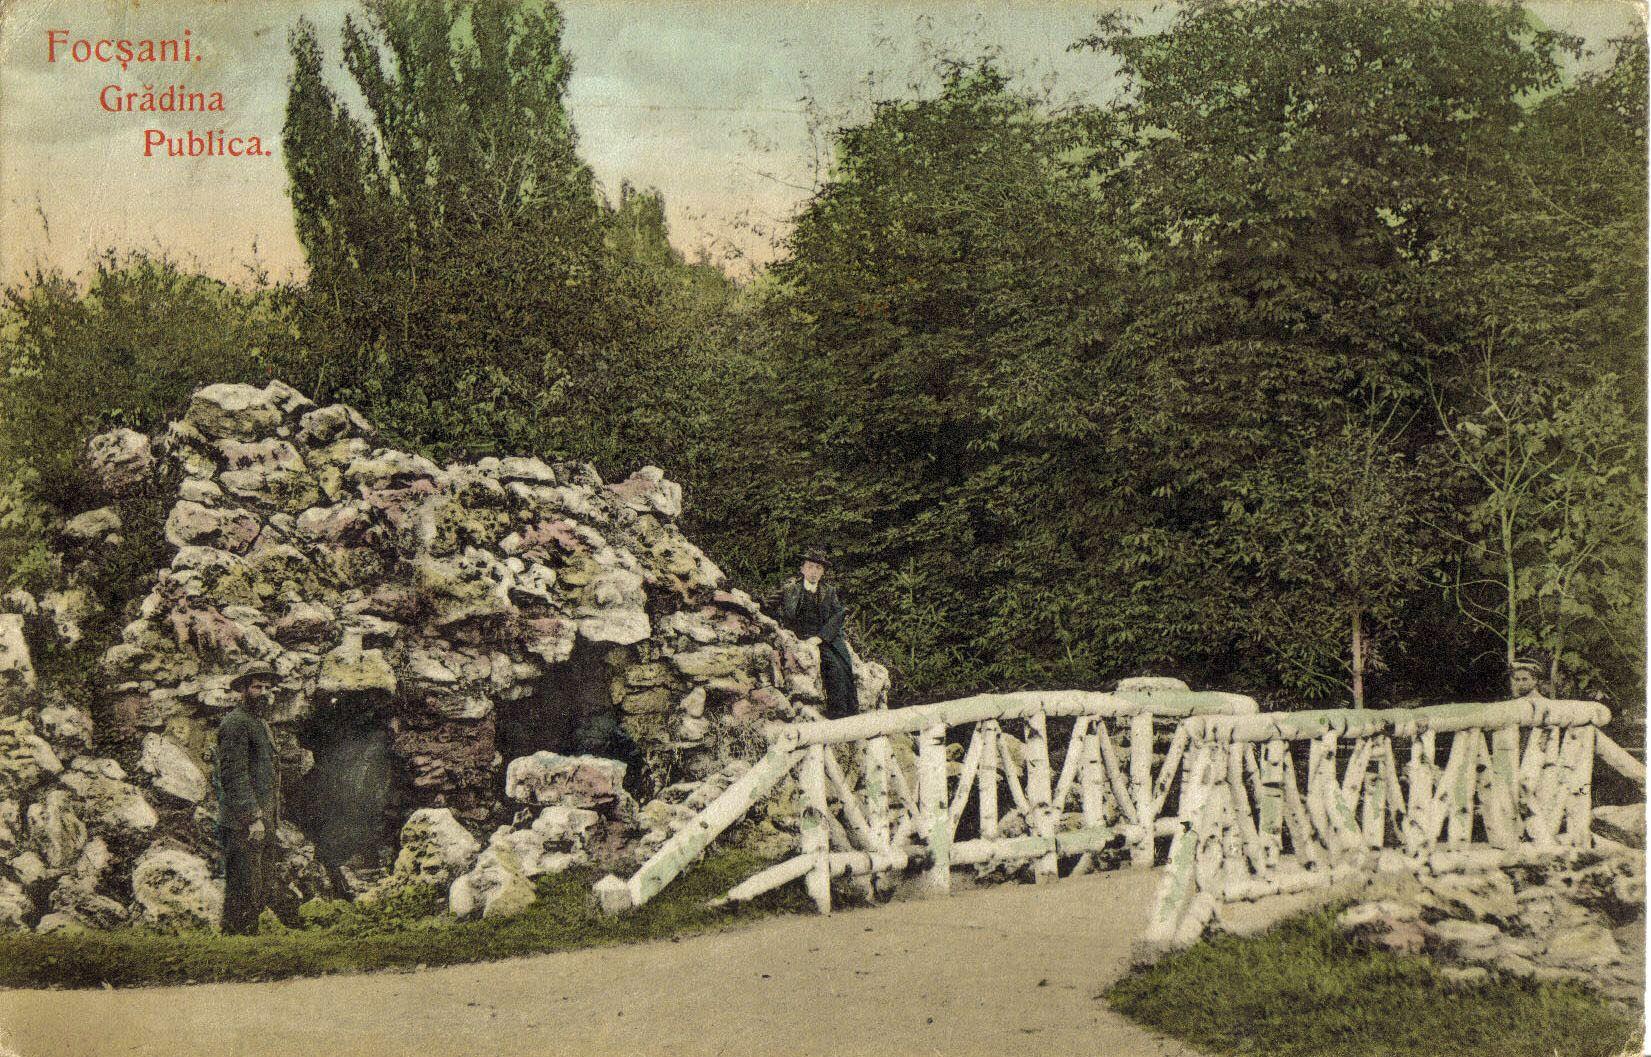 Pietrele din Gradina Publica in urma cu un secol